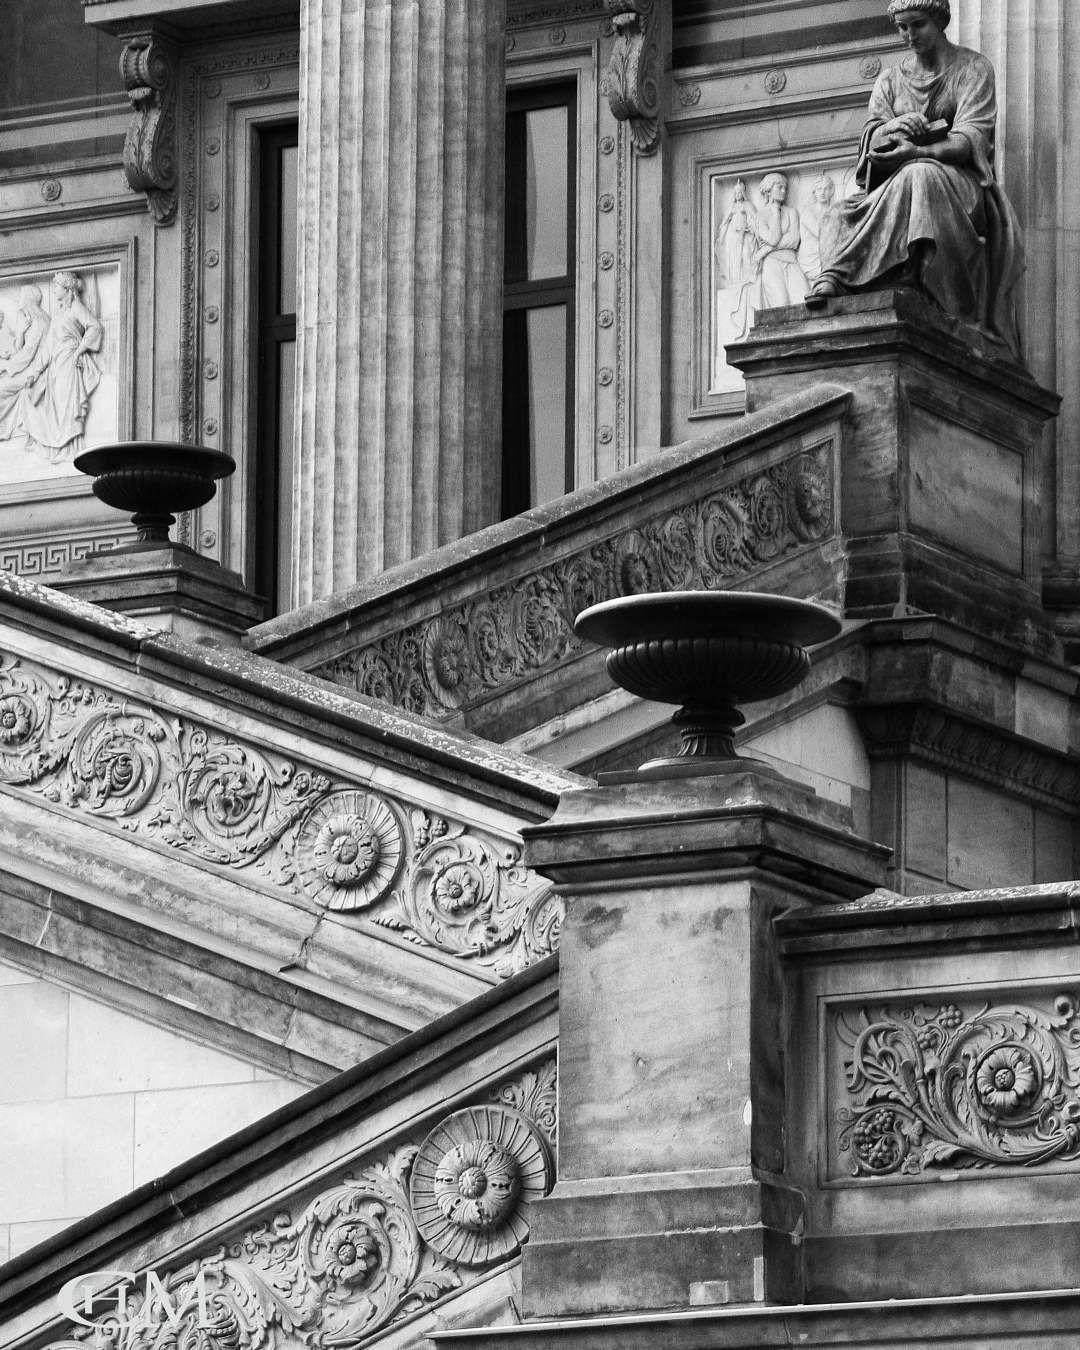 Nikon Berlin Altenationalgalerieberlin Stadtmitte Museum Galerie Architektur Sightseeing Saulen Saulengang Greek Statue Classical Architecture Statue